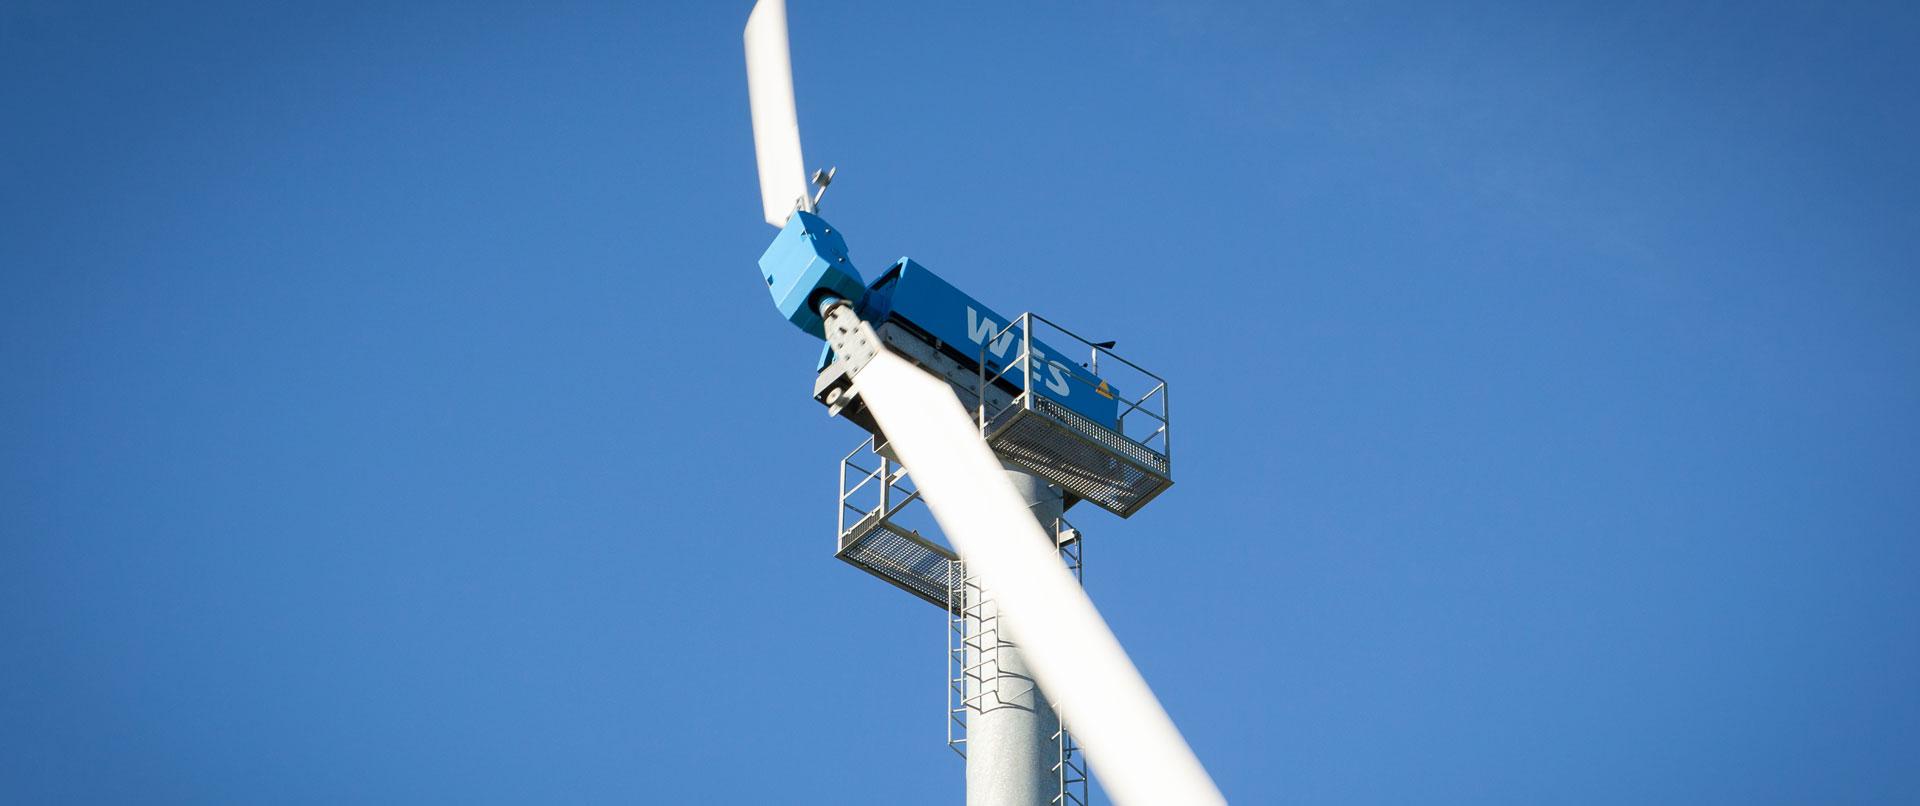 WEs-windturbine